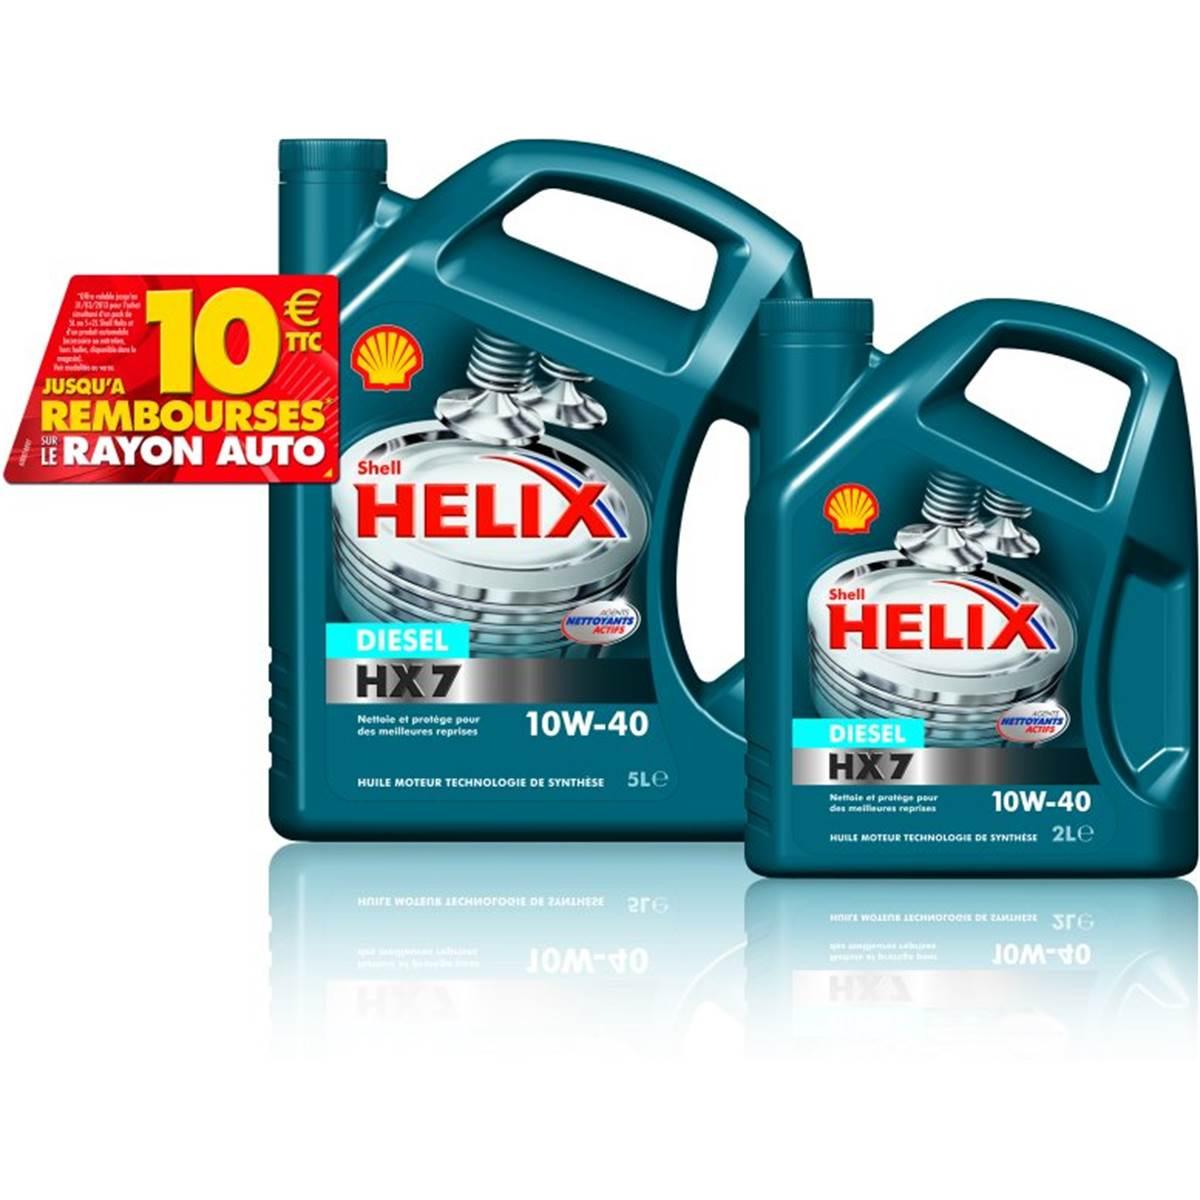 SHELLE HELIX HX7 E 10W40 5L+2L+ ODR 8 EUROS